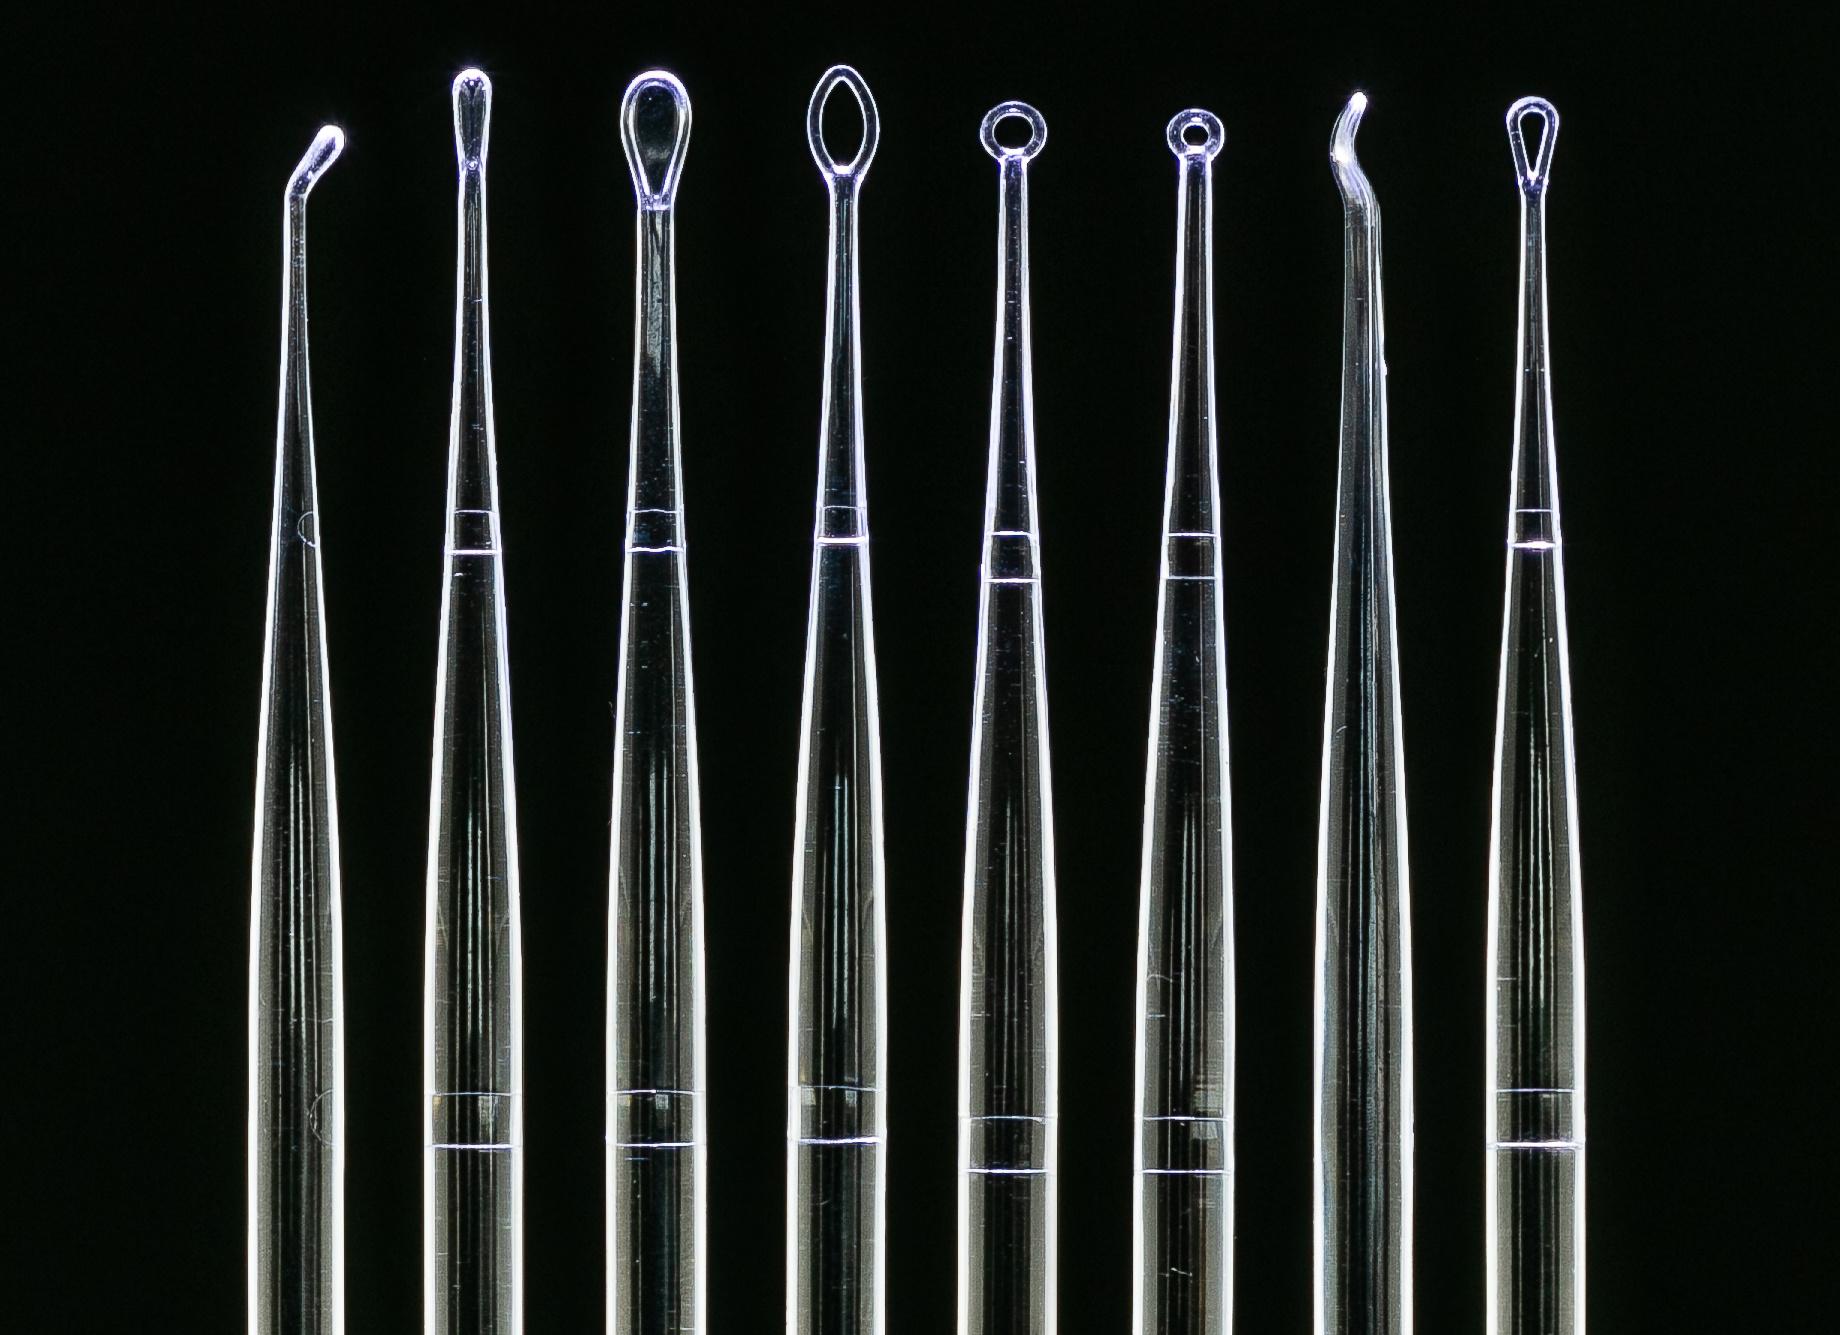 Bionix - illuminated ear curettes - 50 pcs